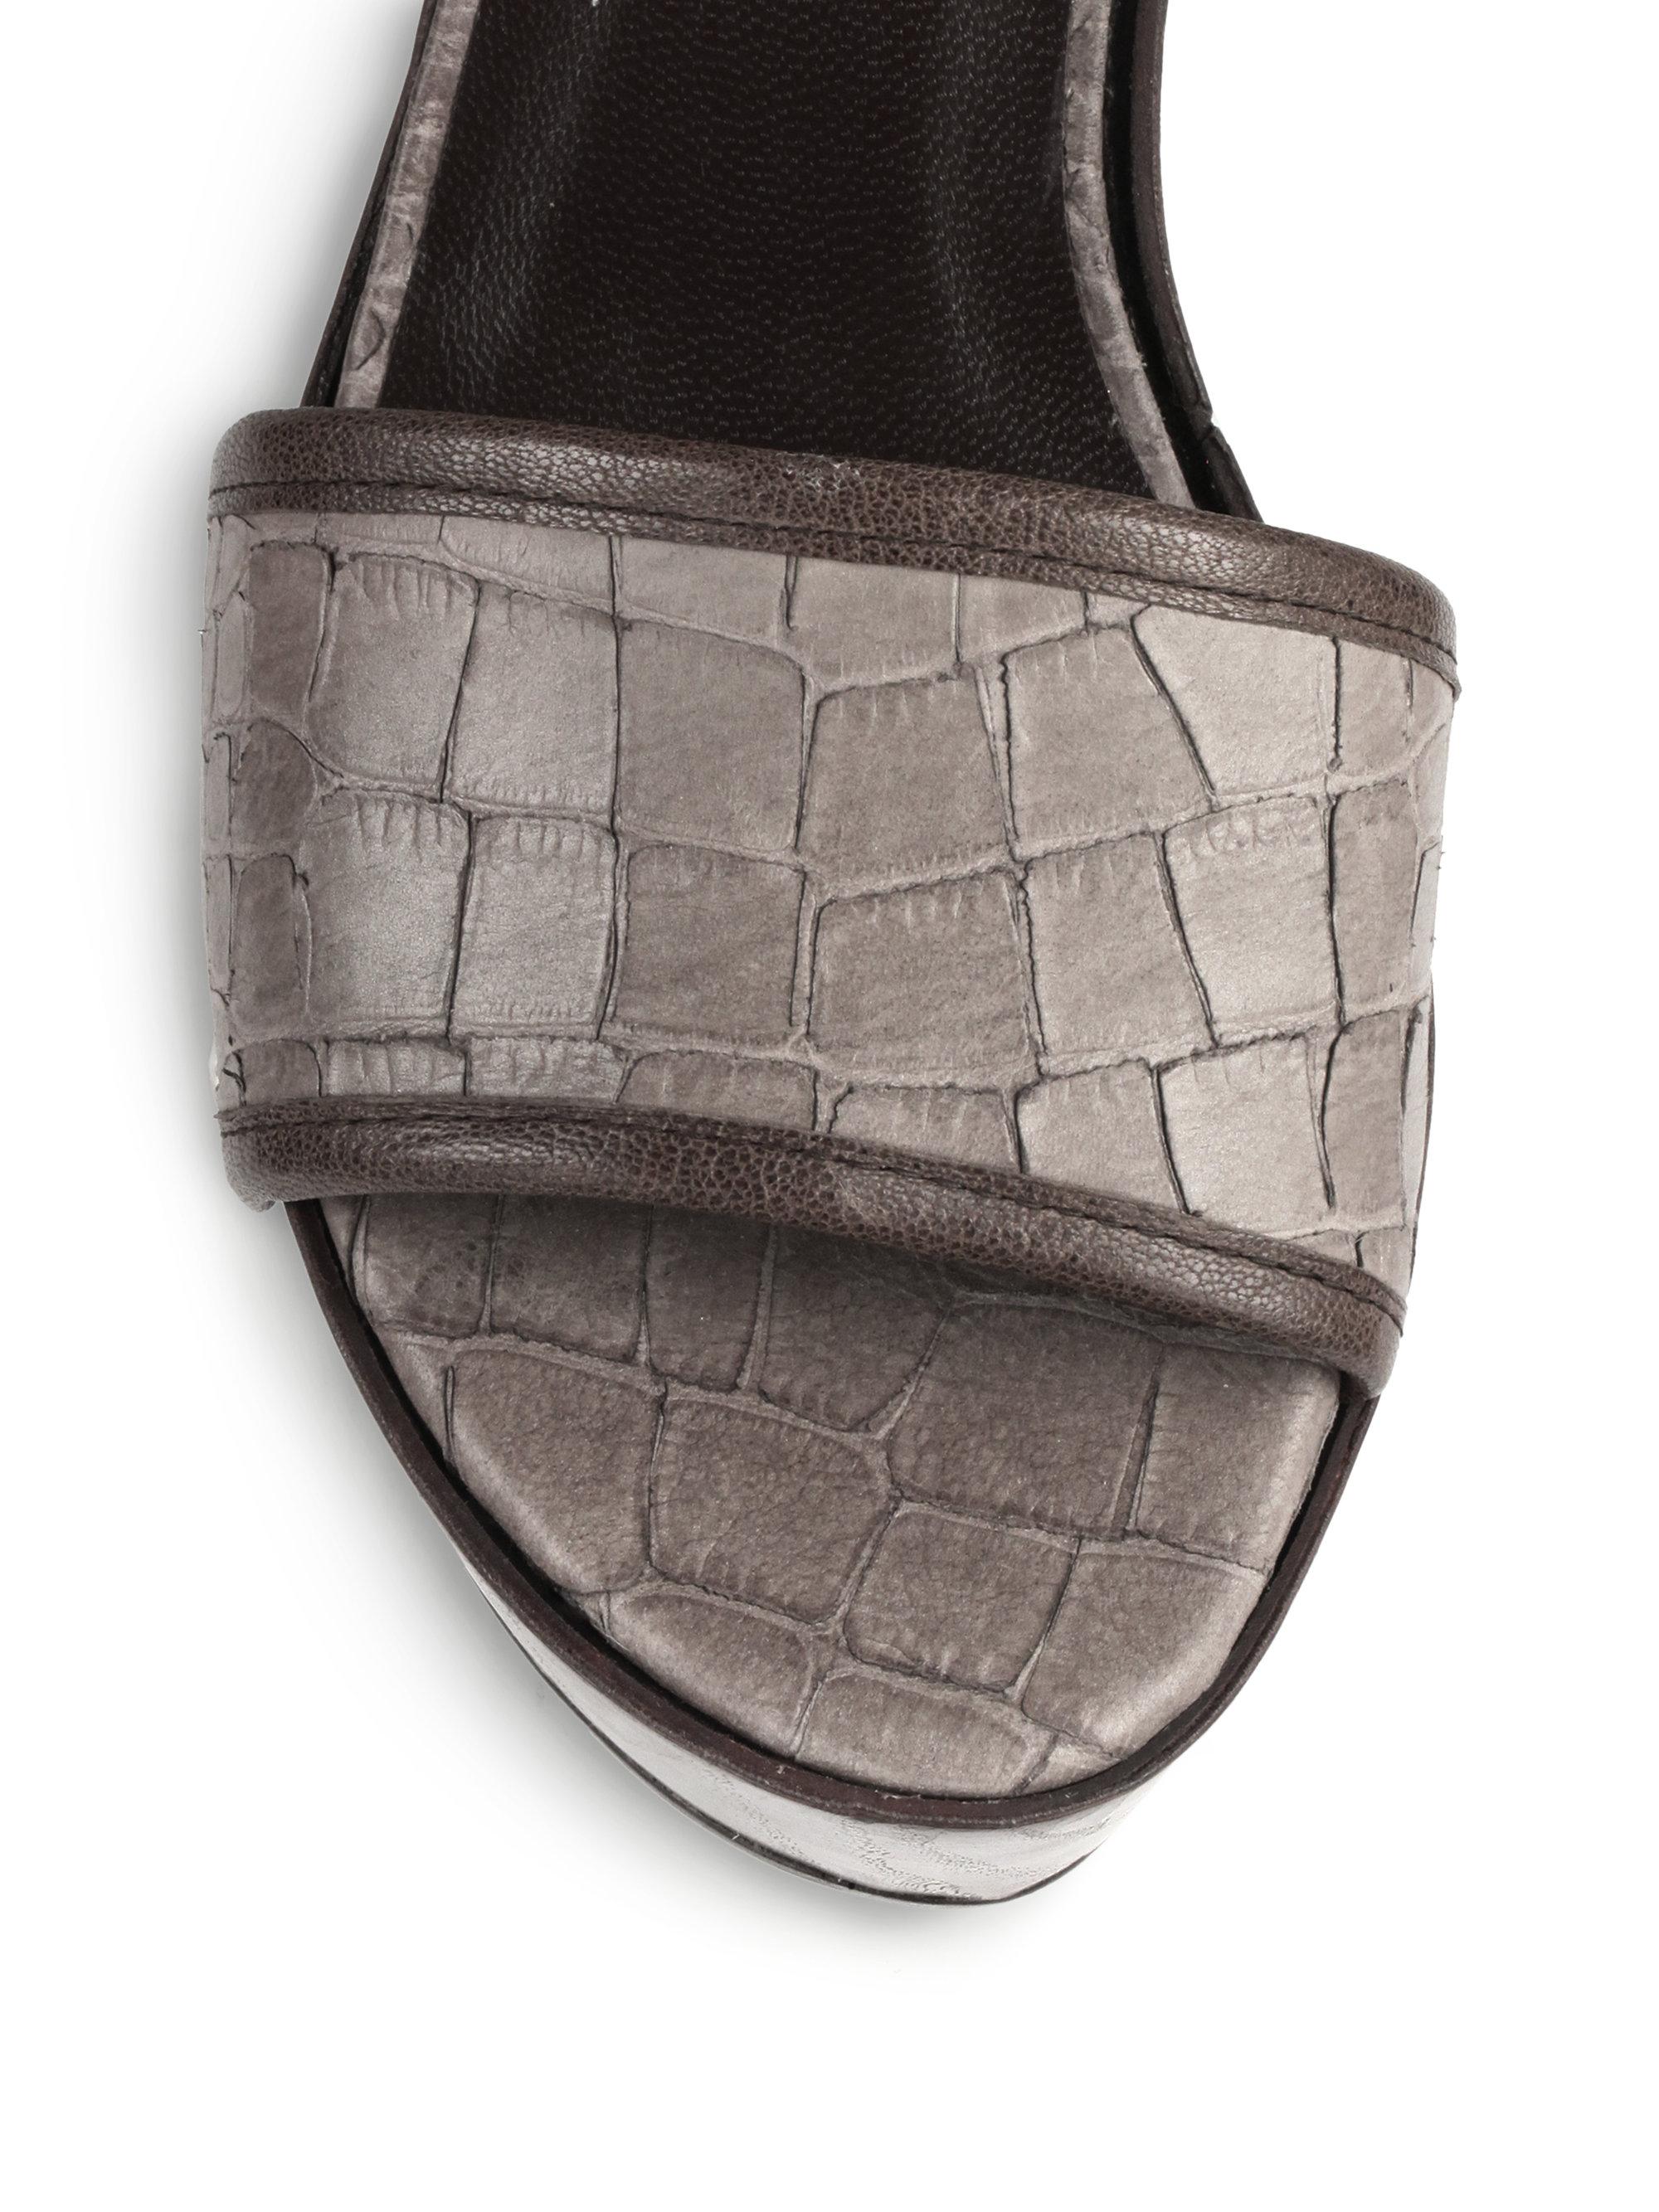 Stuart Weitzman Croc Embossed Leather Platform Wedge